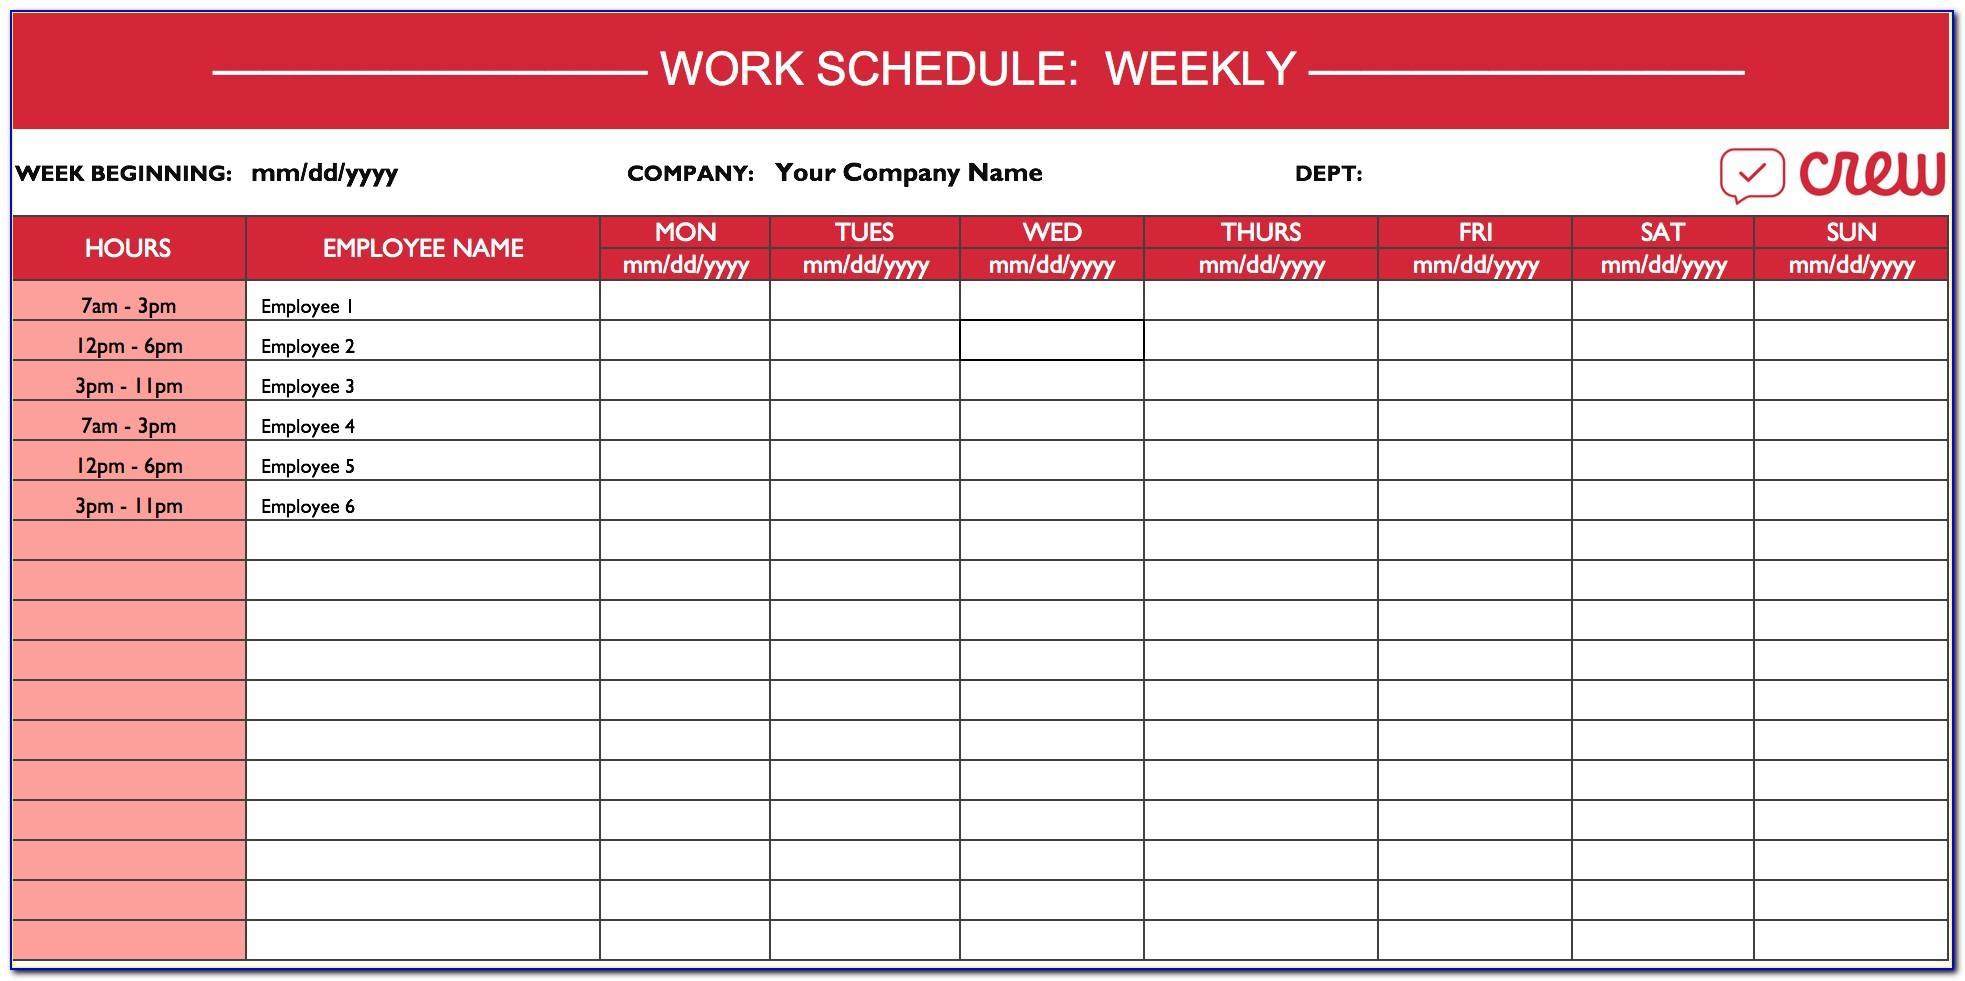 Weekly Work Schedule Template Excel Free